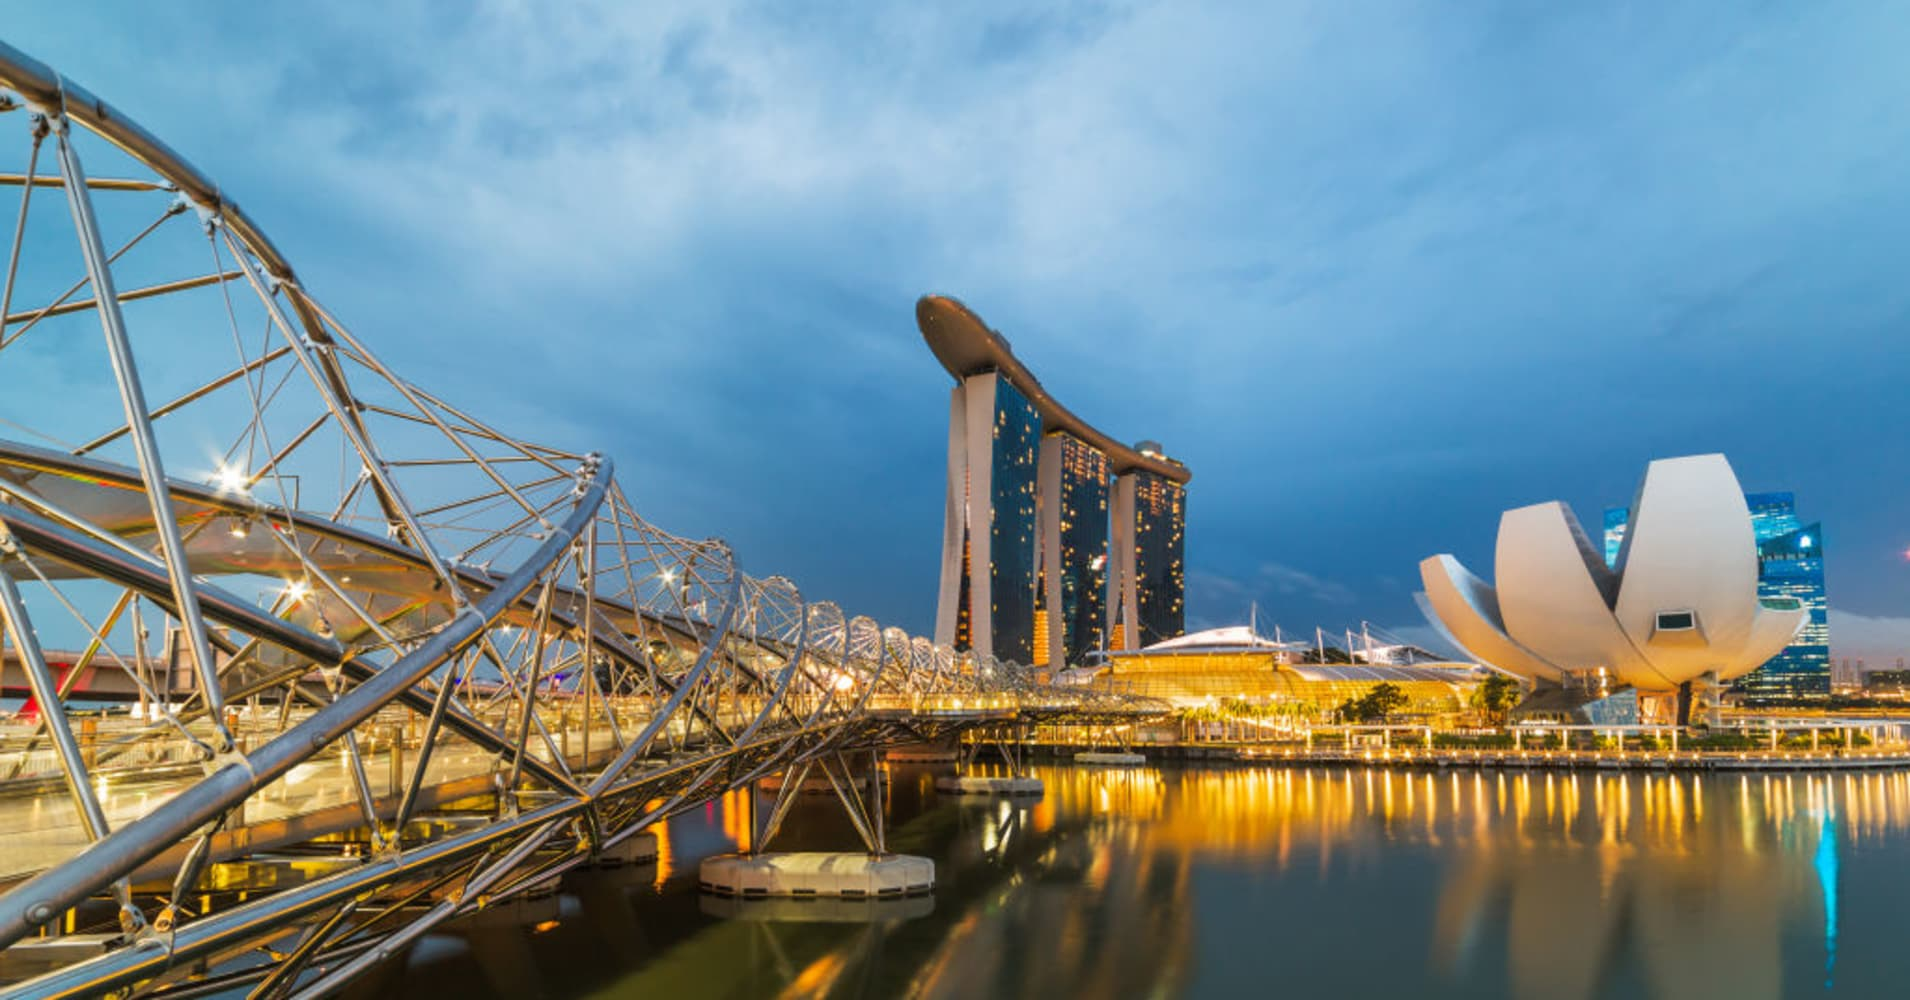 Singapore's fourth quarter GDP growth below forecast as trade concerns darken outlook